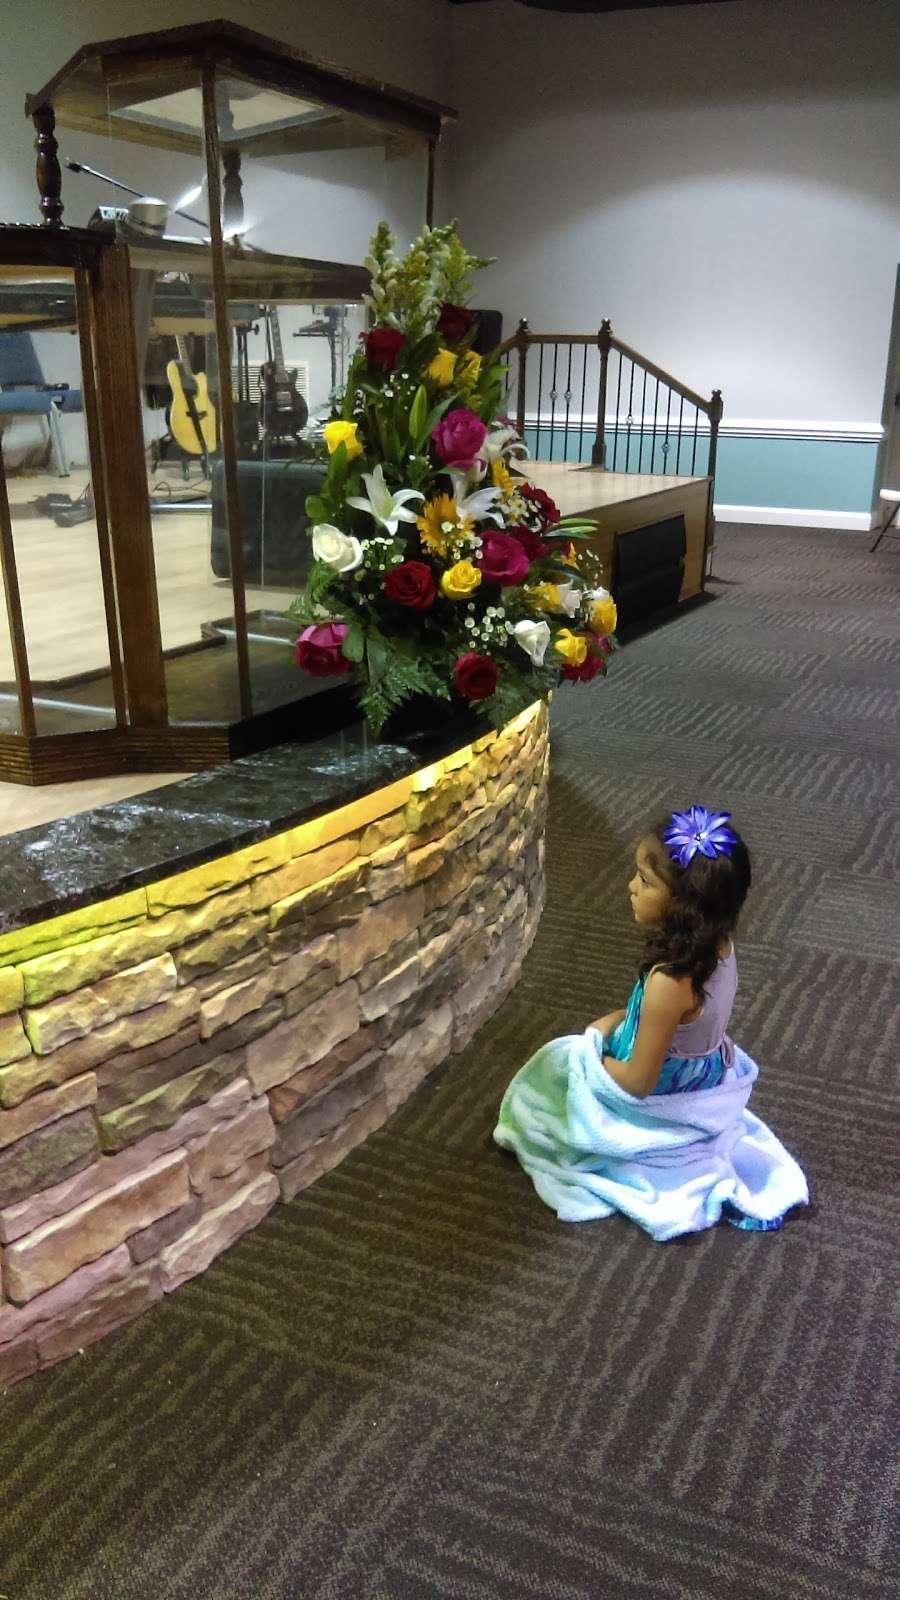 Iglesia El Siloe - church  | Photo 8 of 10 | Address: 5420 Kimmerly Glen Ln, Charlotte, NC 28215, USA | Phone: (704) 502-4444